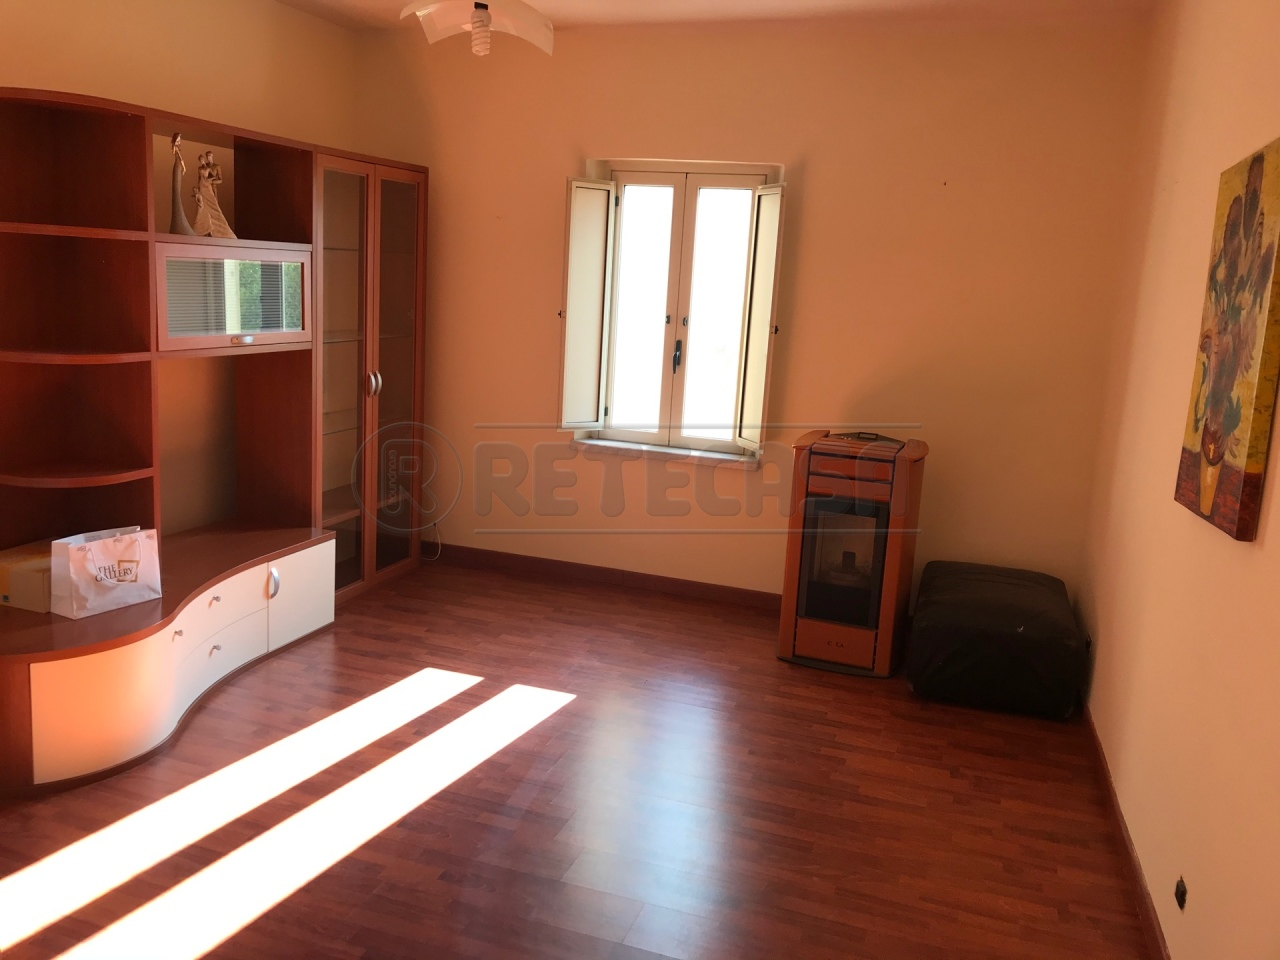 Casa indipendente in affitto a Catanzaro (CZ)